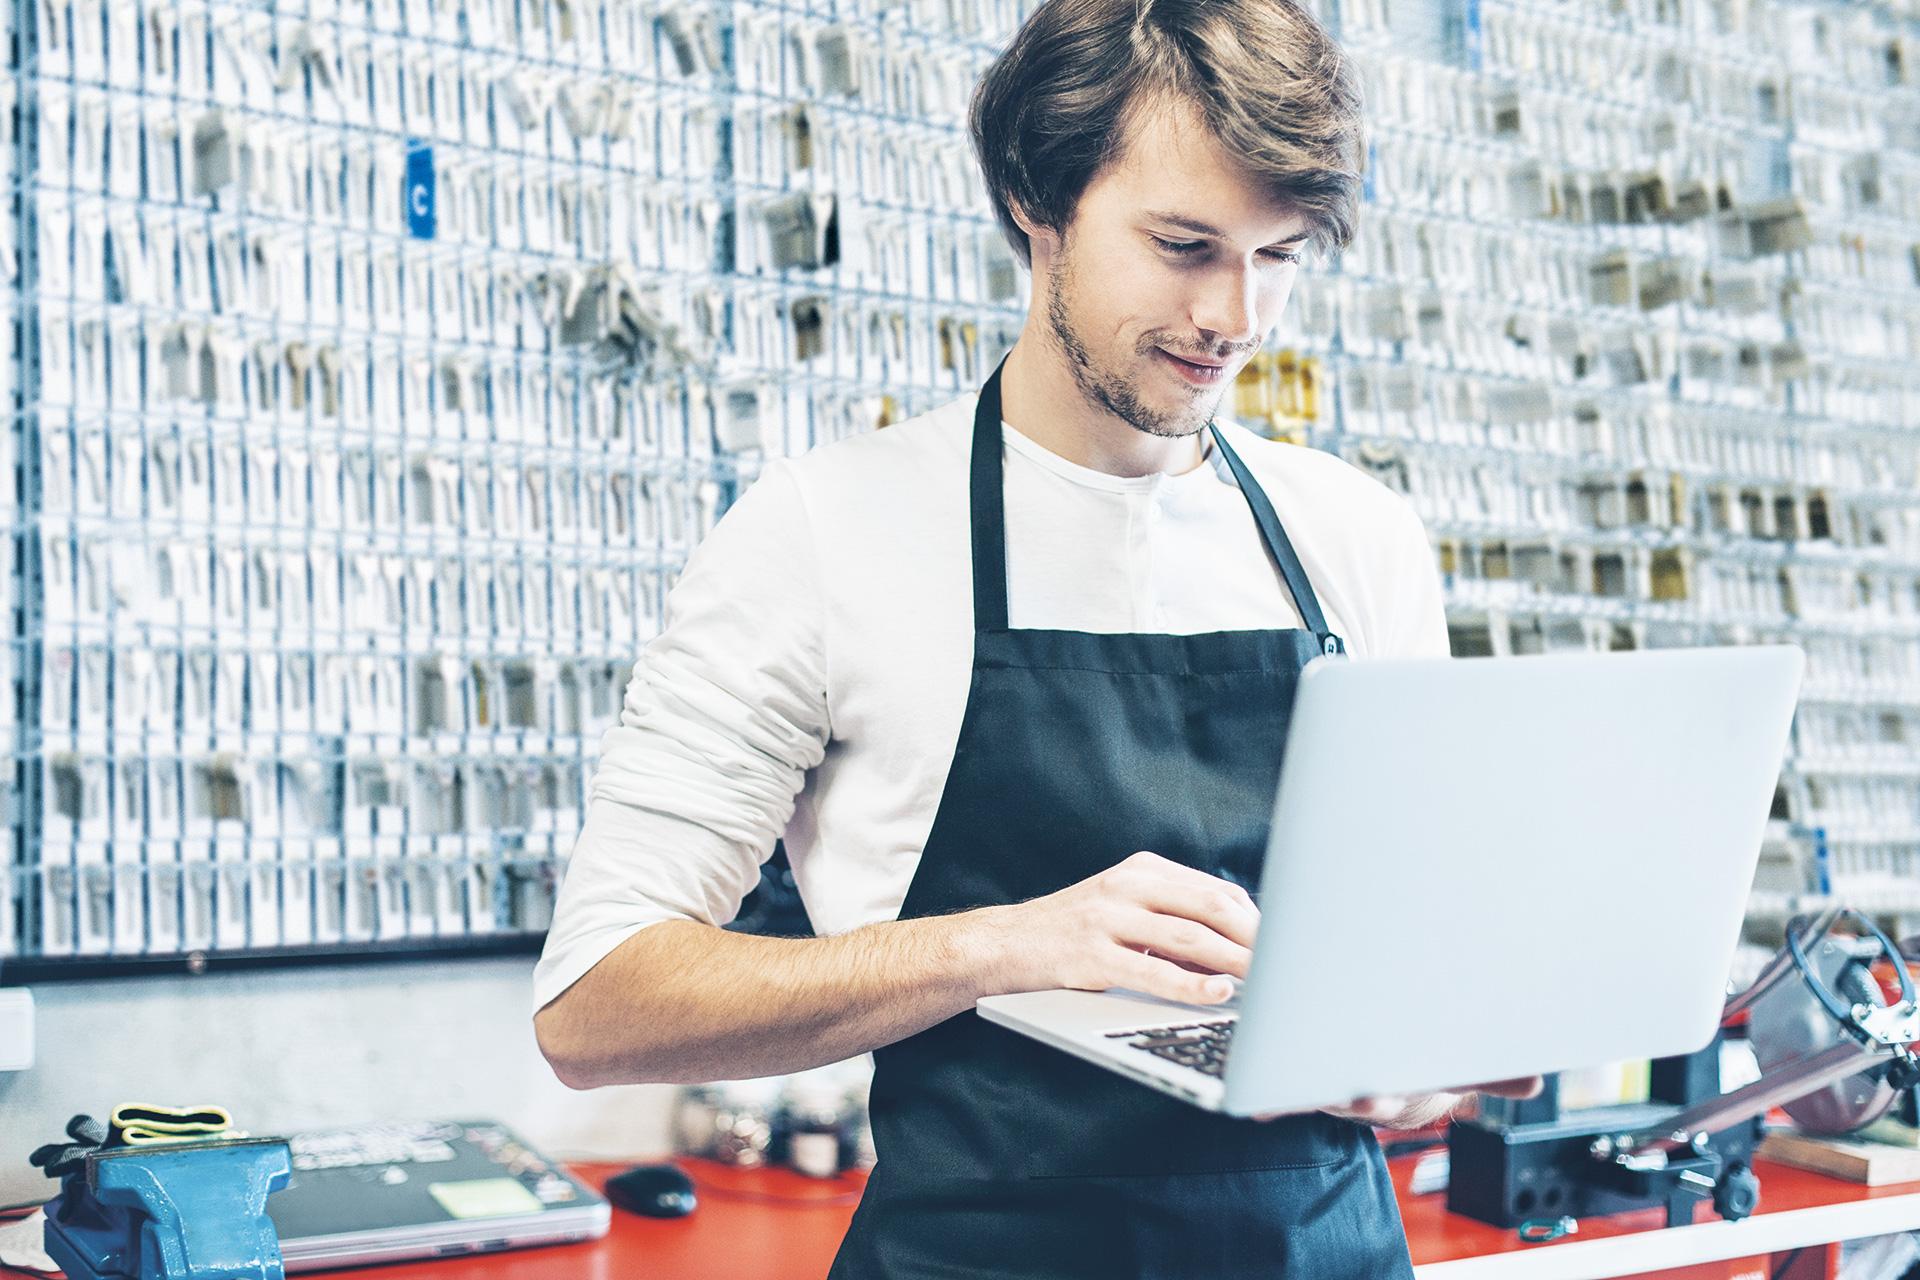 Locksmith standing behind his laptop